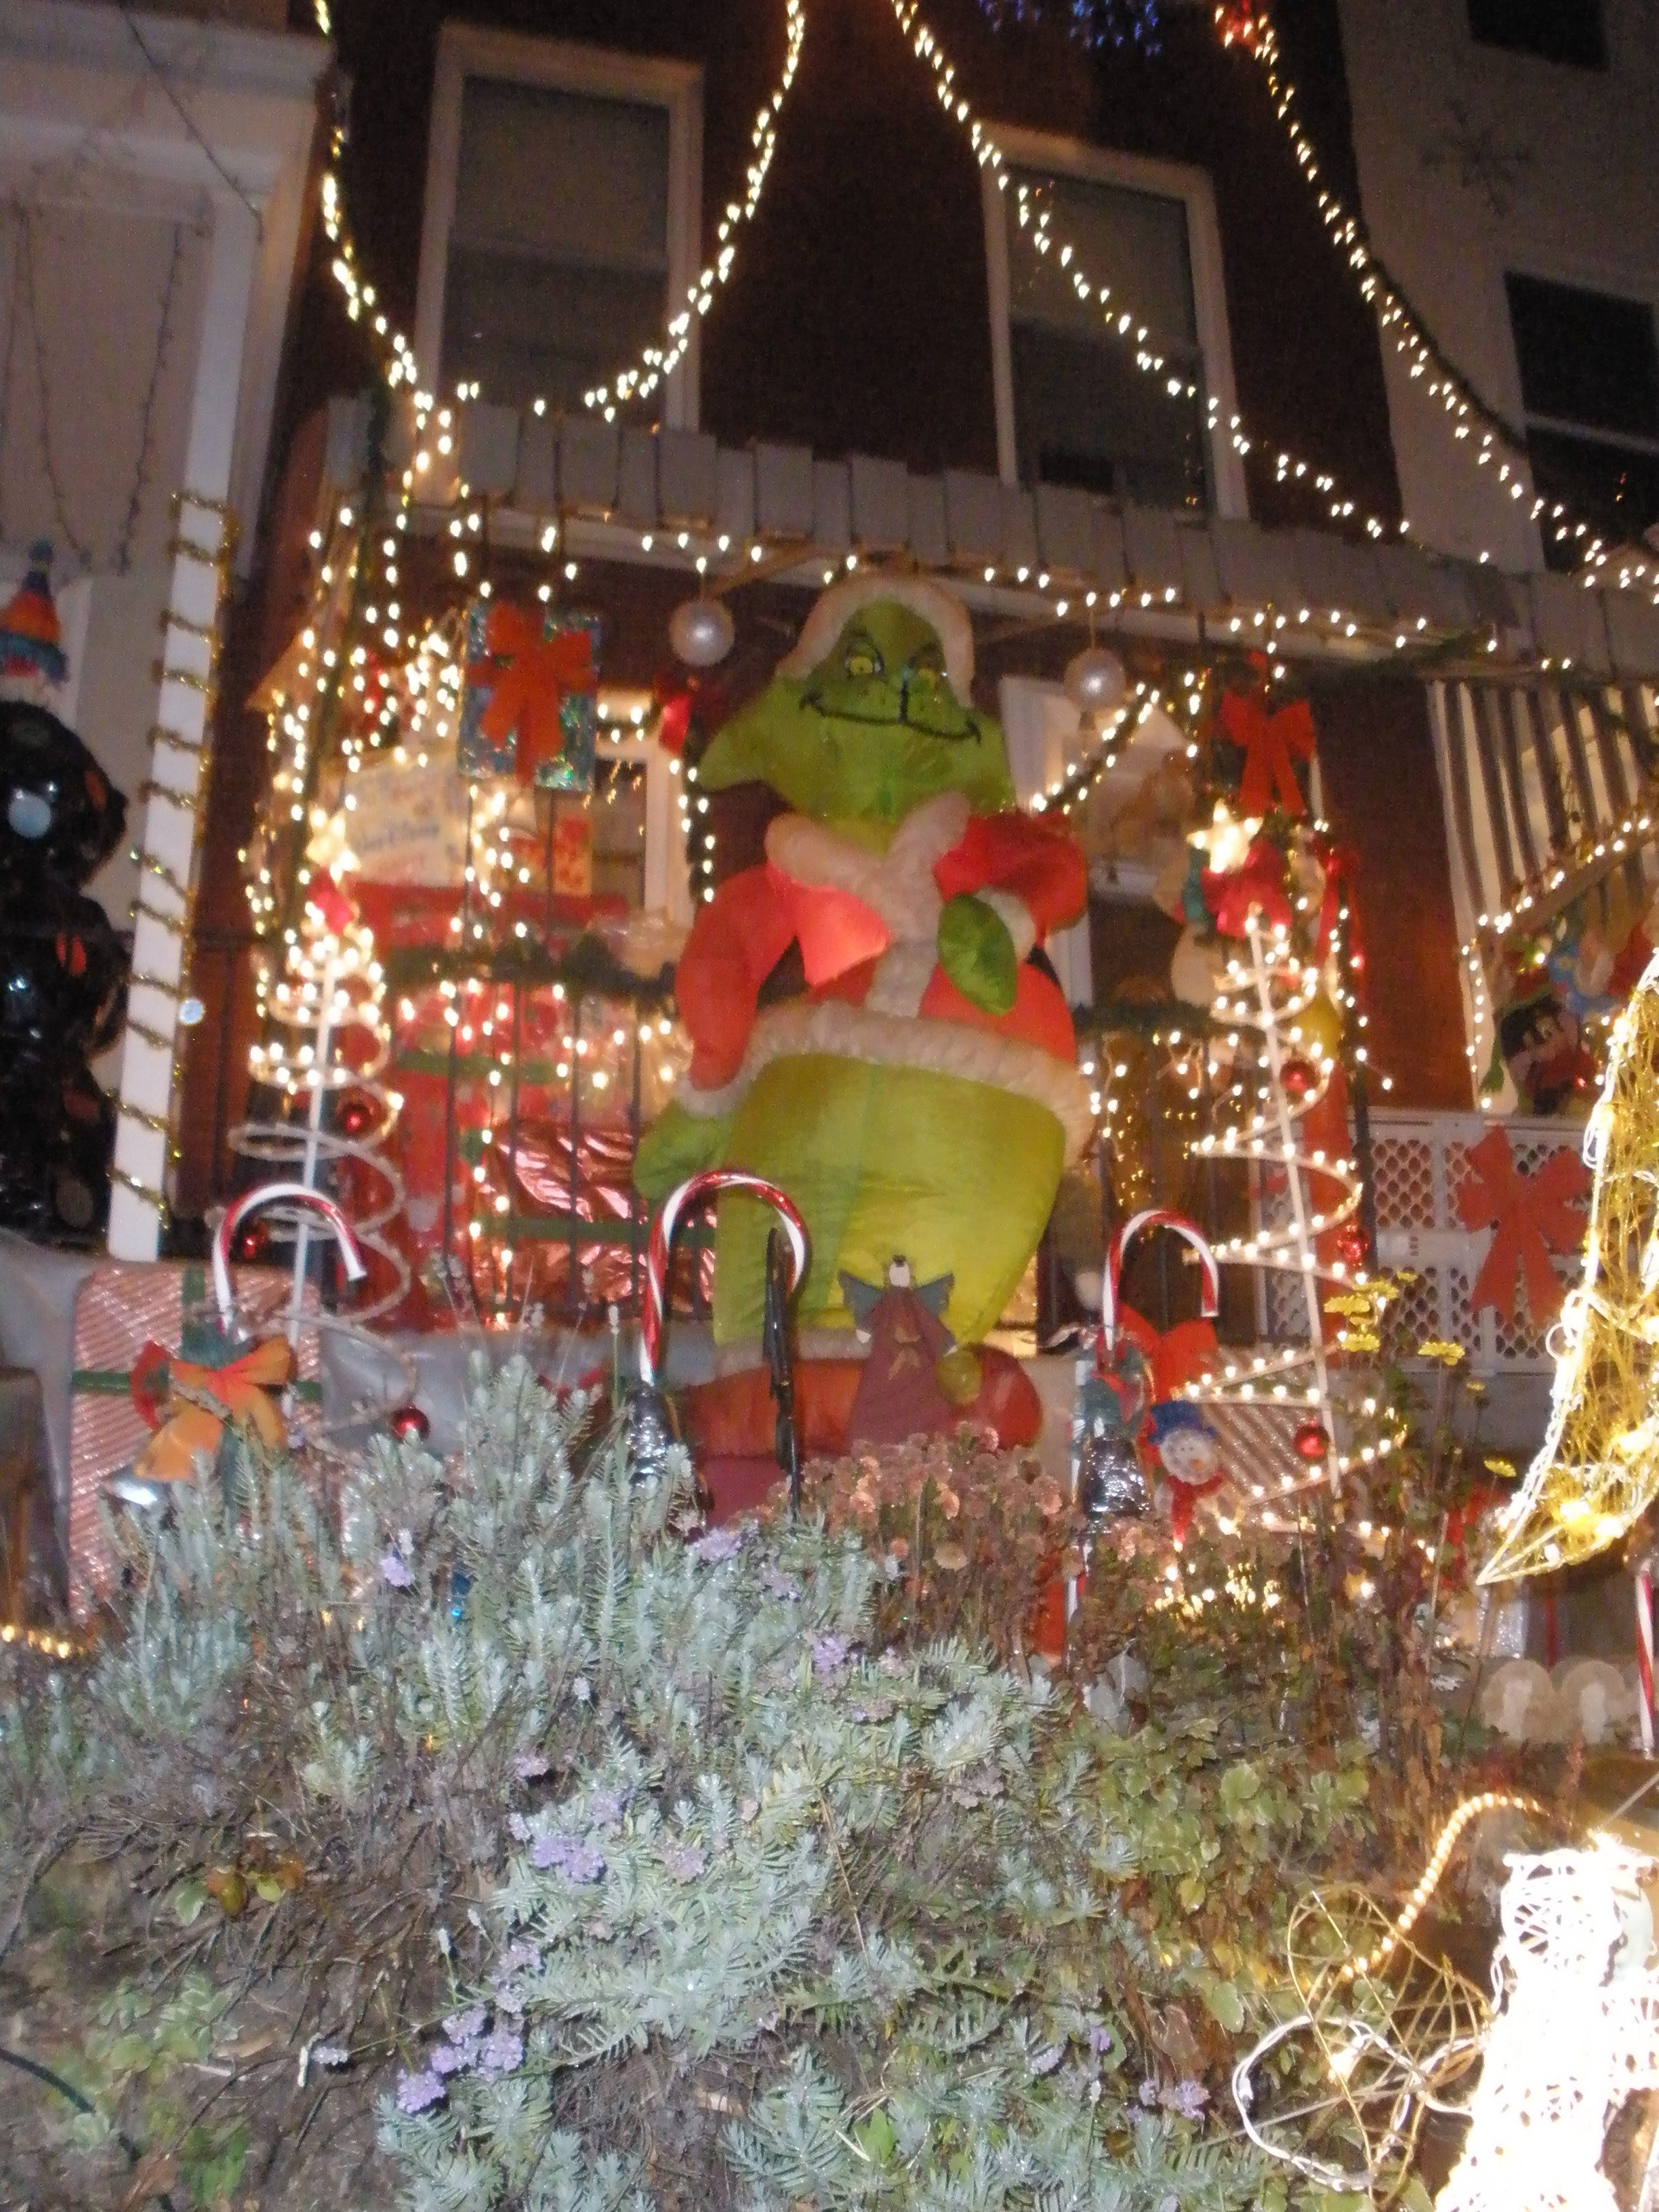 Baltimore Sightseeing Christmas Lights in Hampden